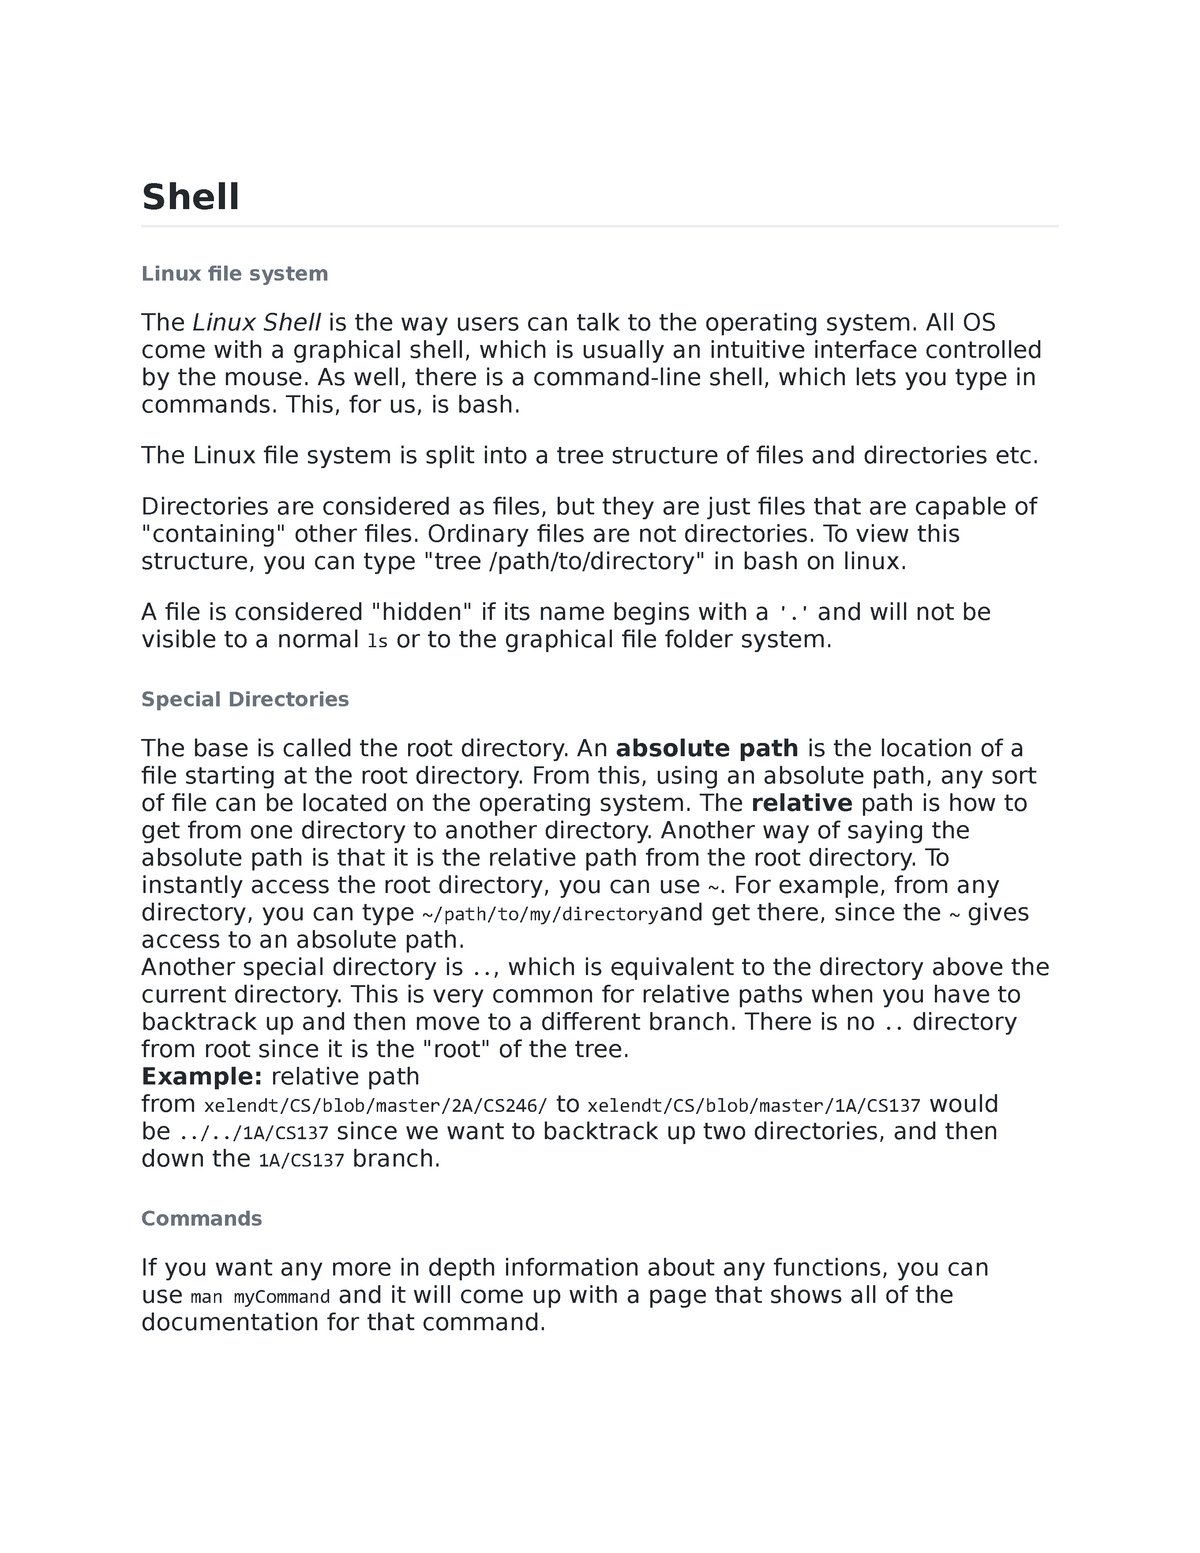 CS246 - Shell Overview - Cs 246: Object-Oriented Software Devel